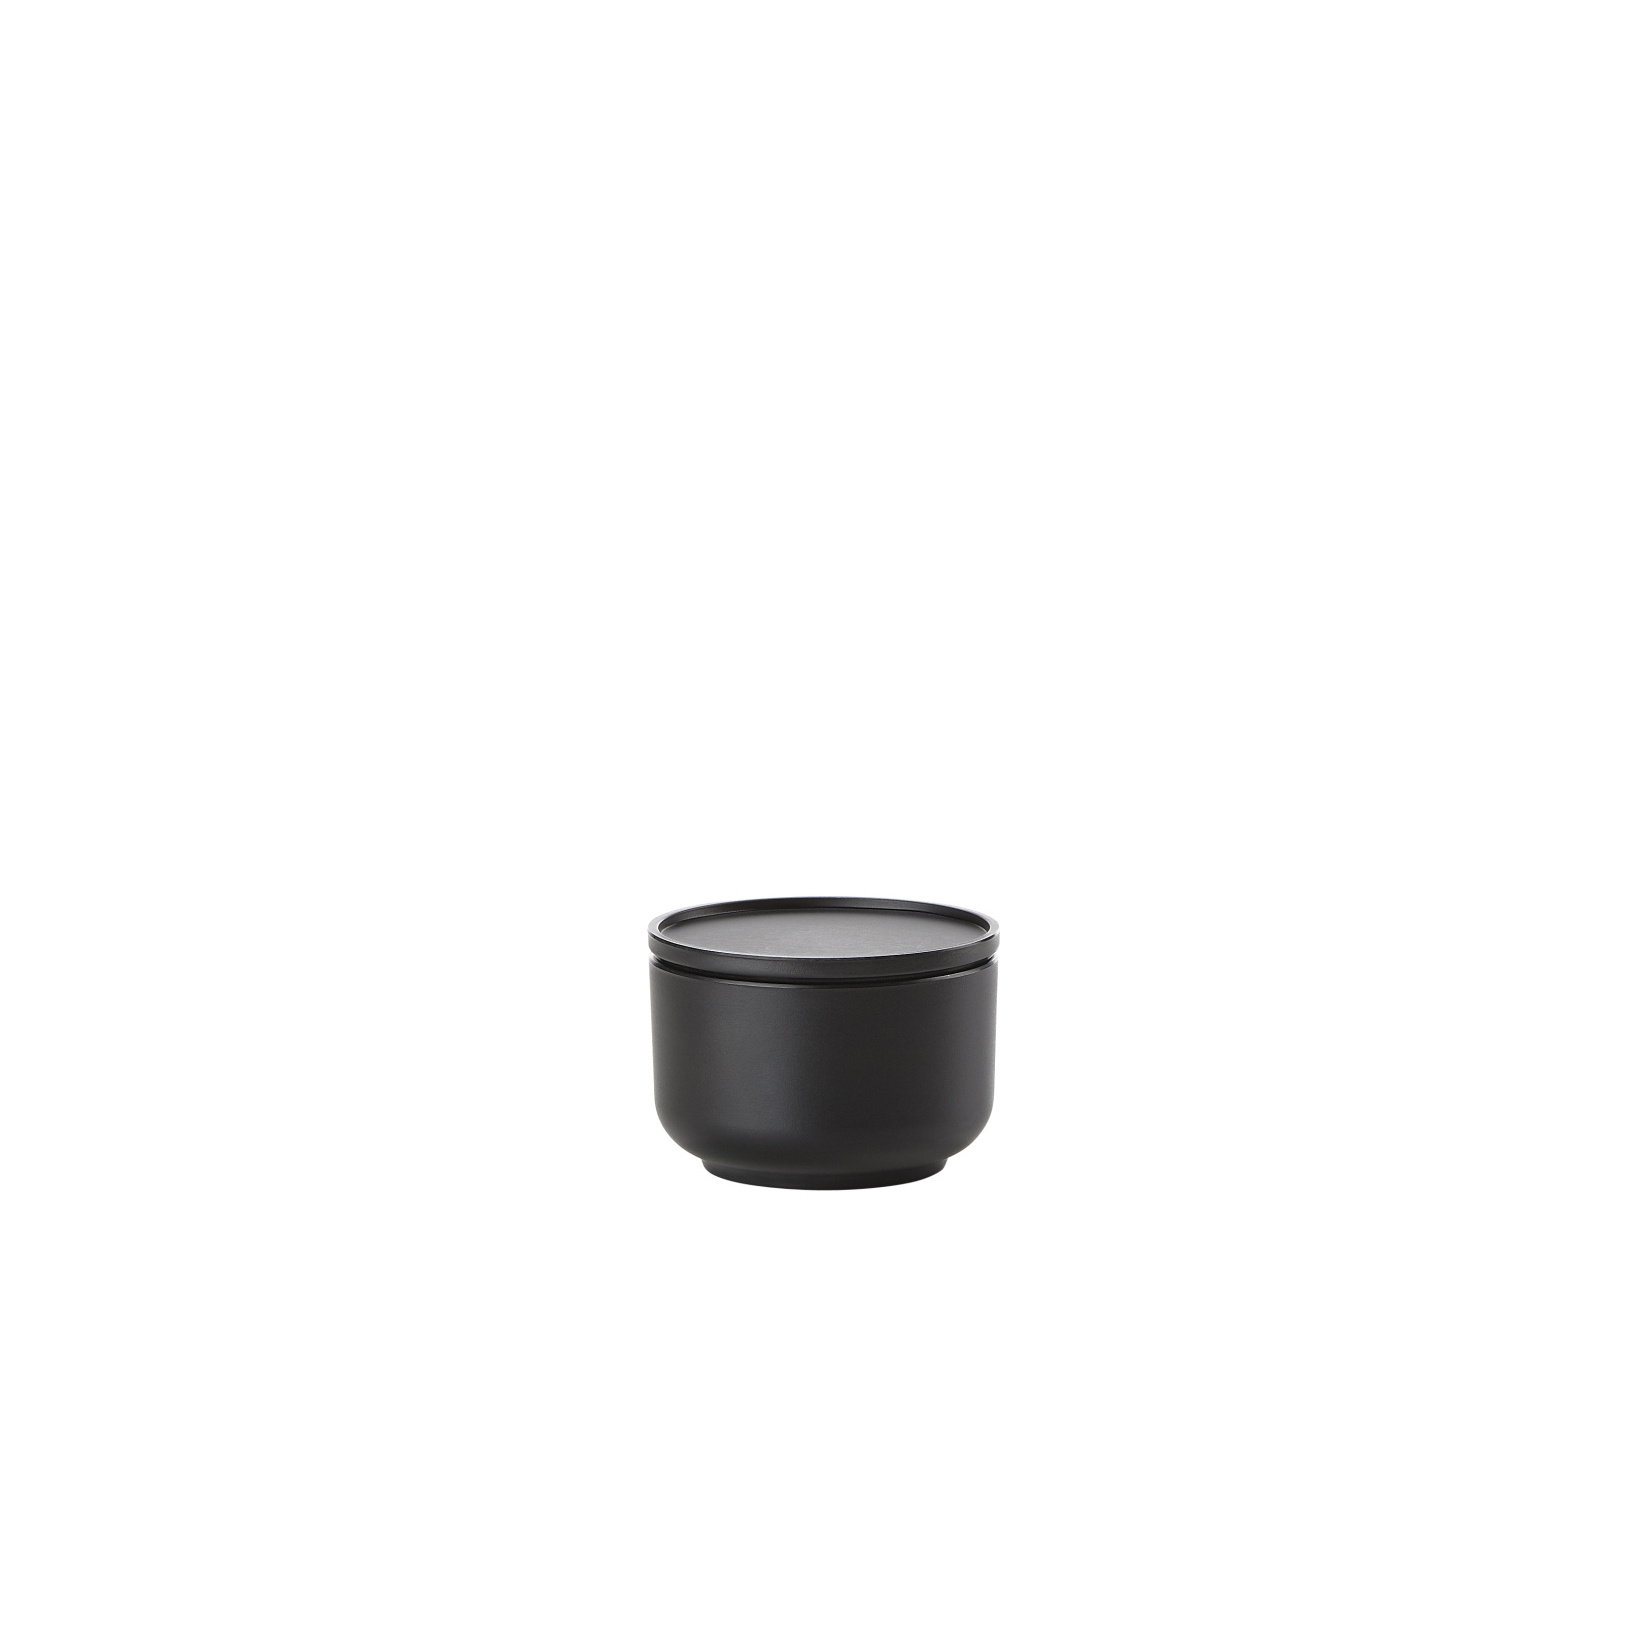 Servírovací mísa 0,25 l, černá, Peili - Zone Denmark